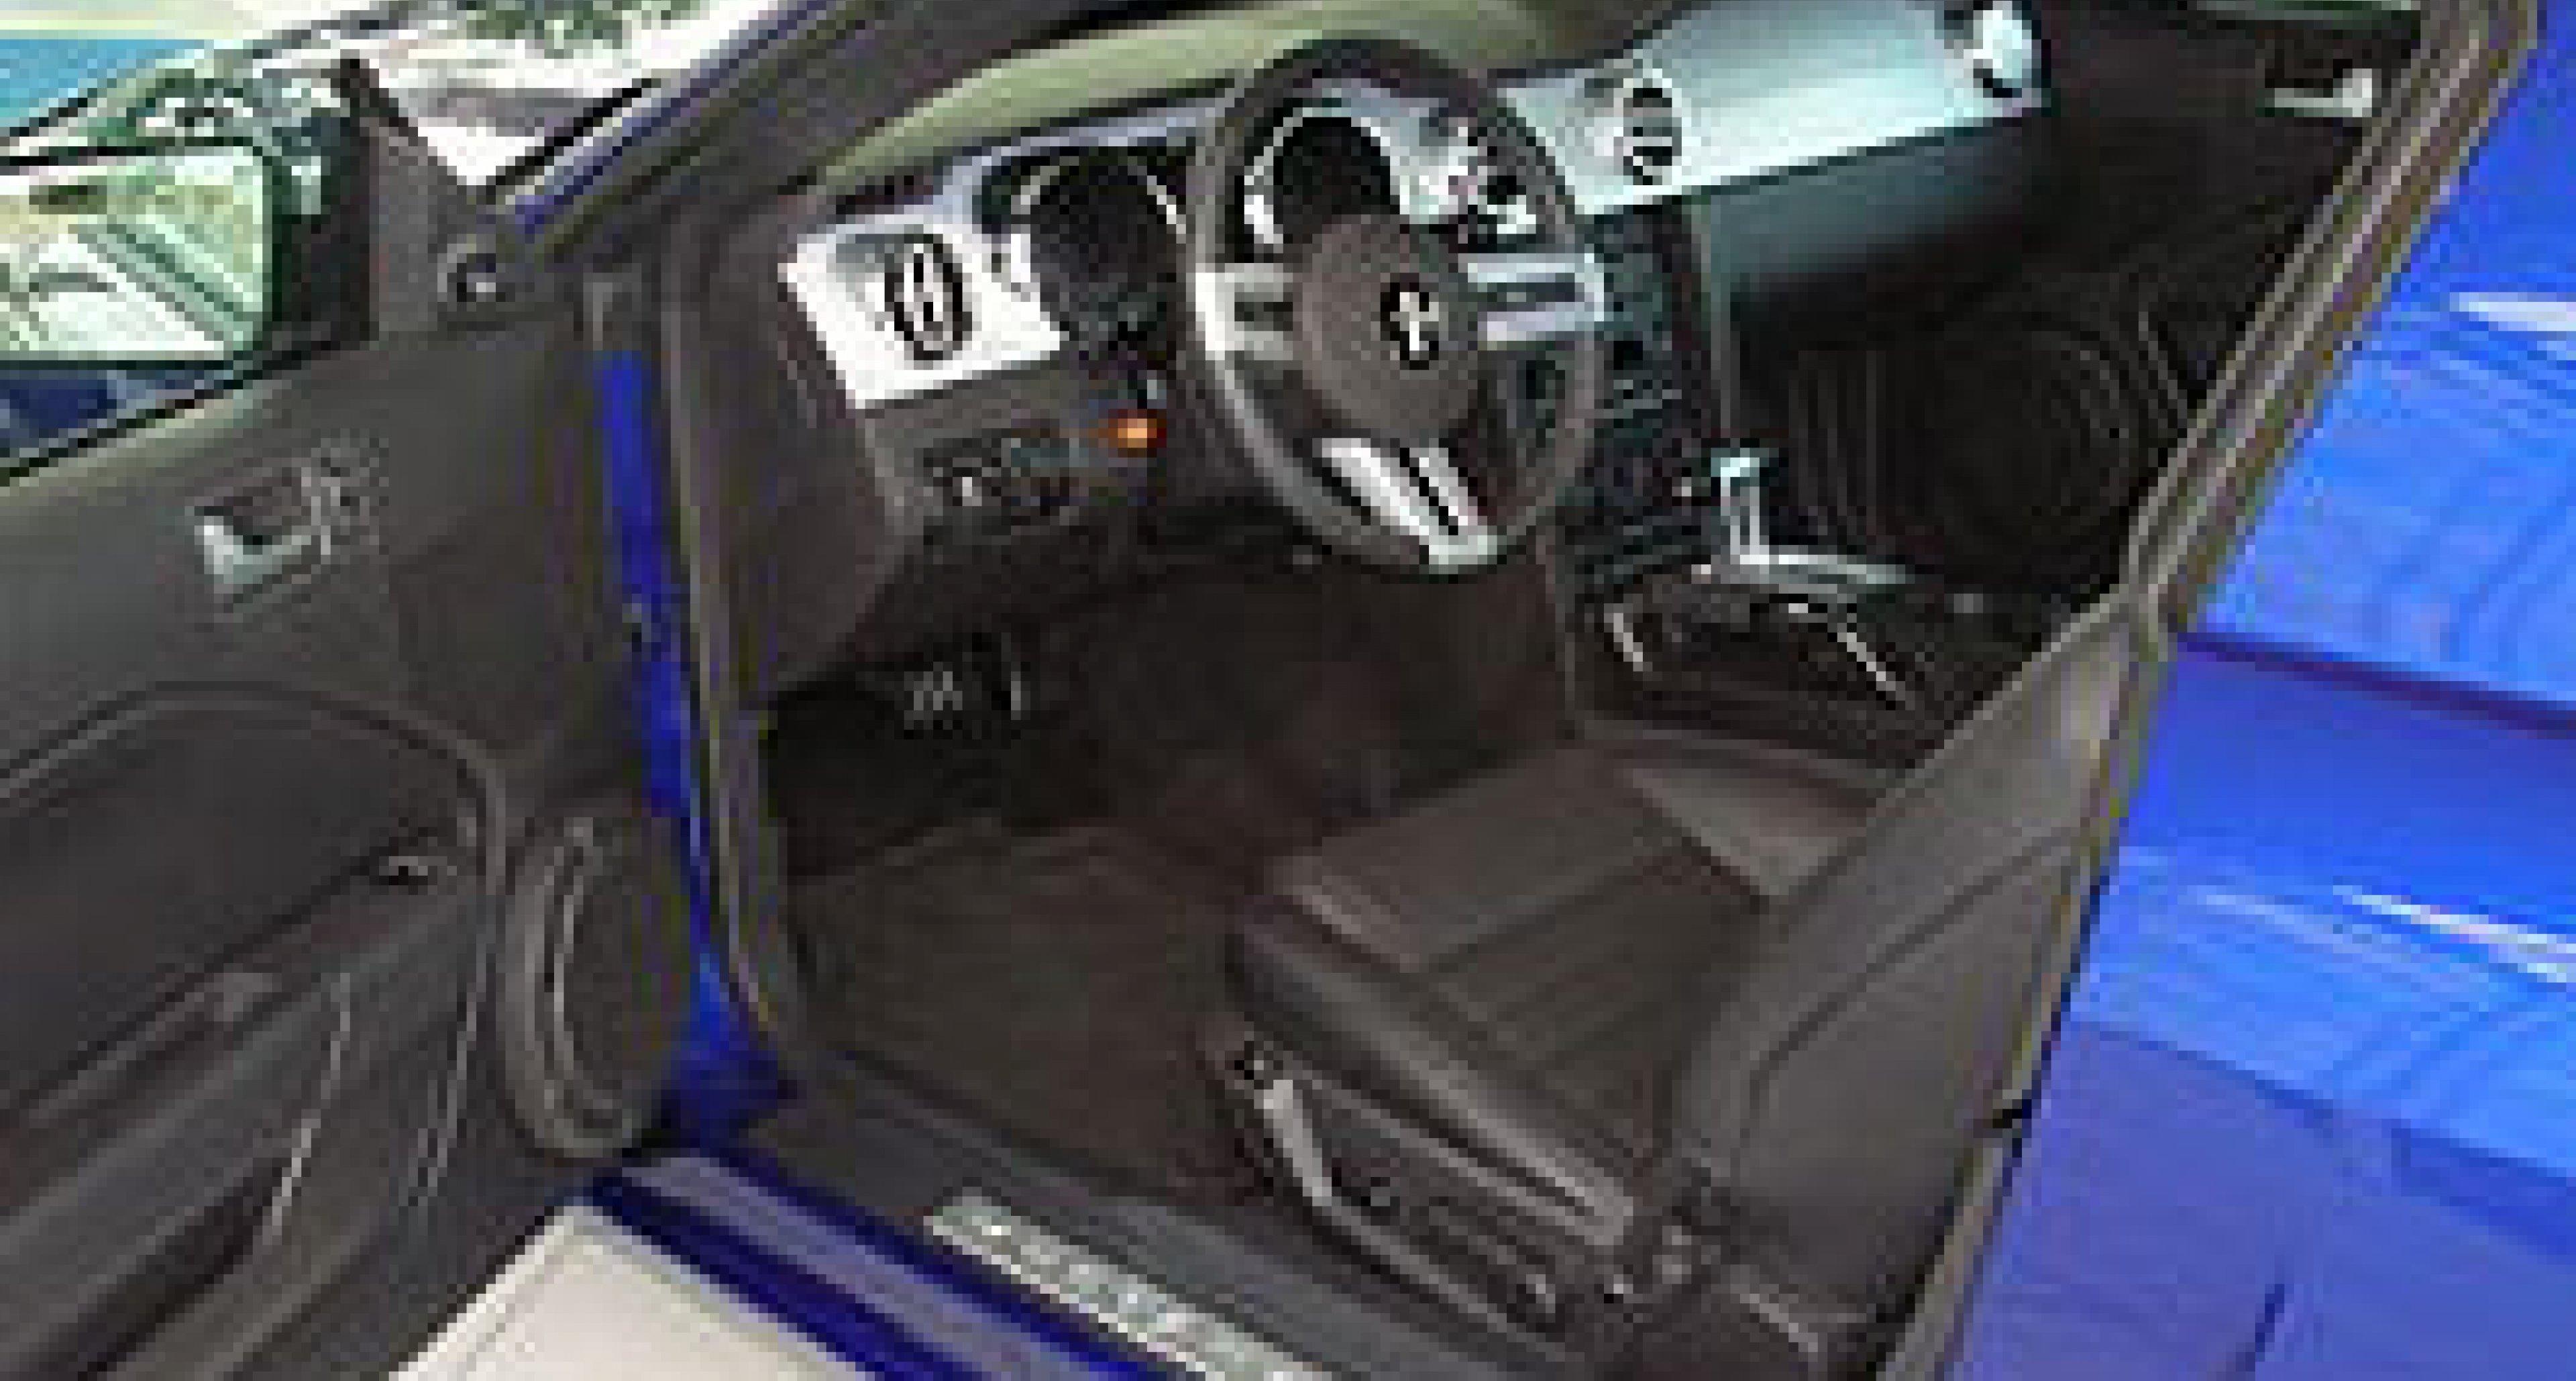 Mustang bei Ford Kleine in Paderborn